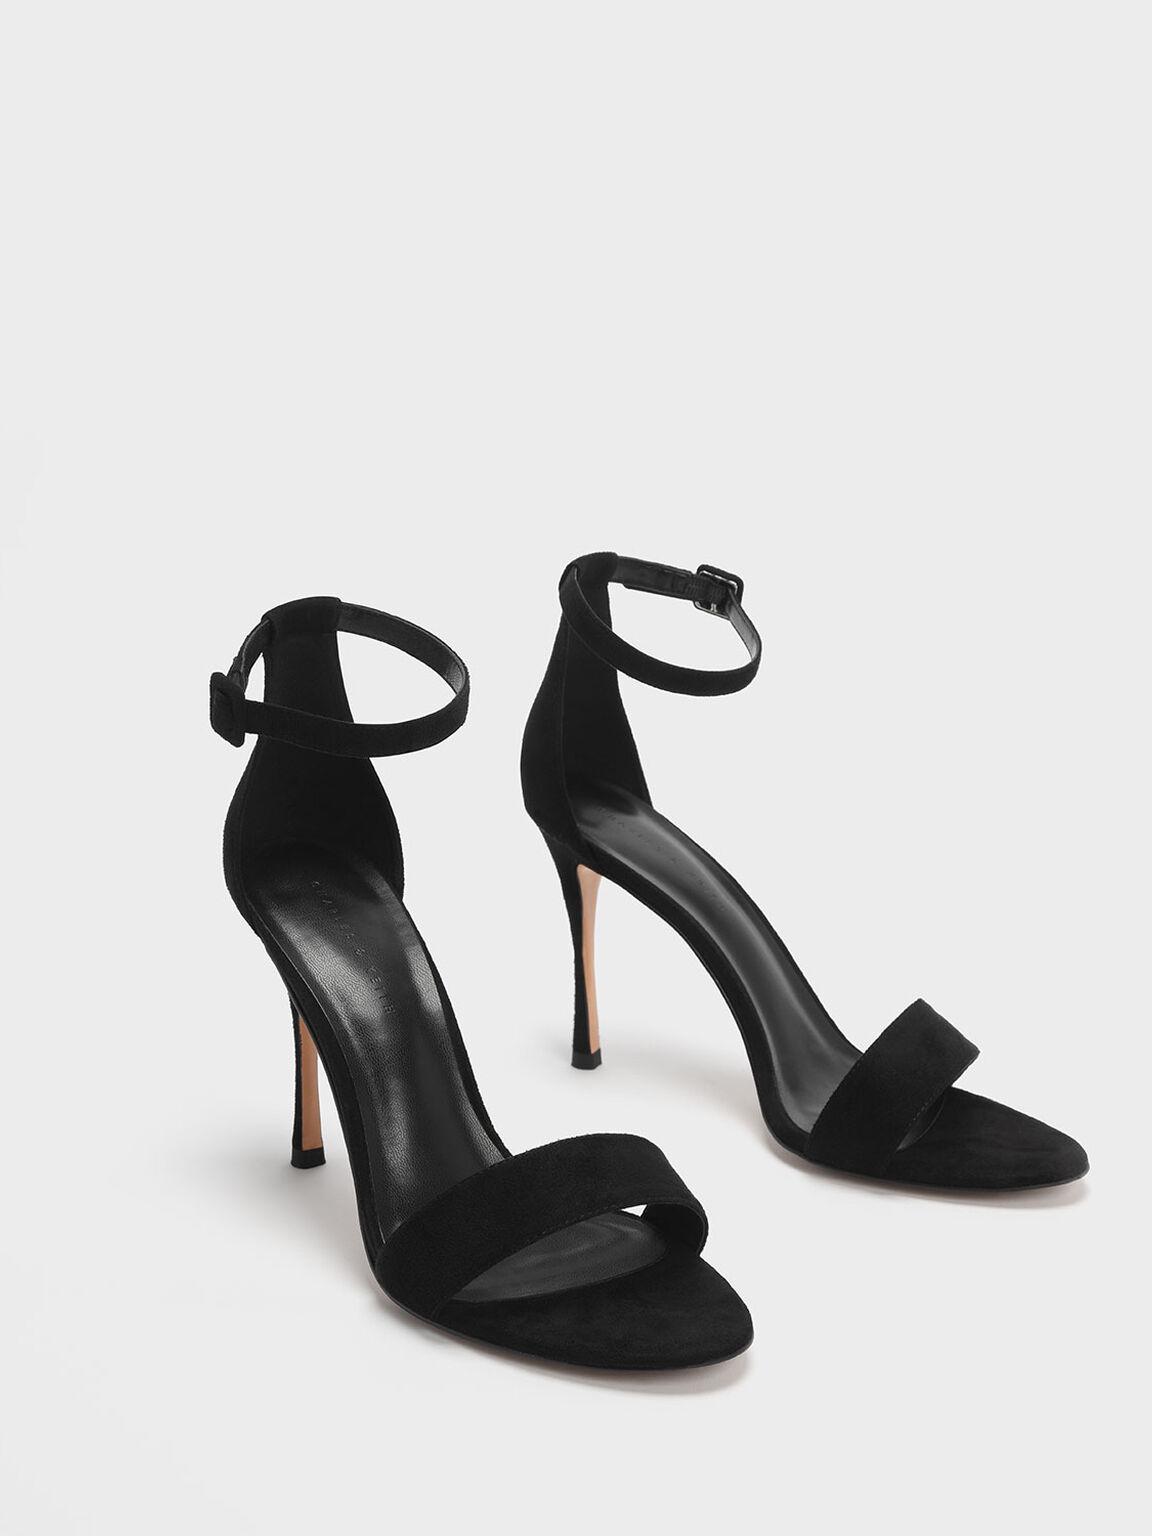 Textured Ankle Strap Stiletto Heels, Black, hi-res